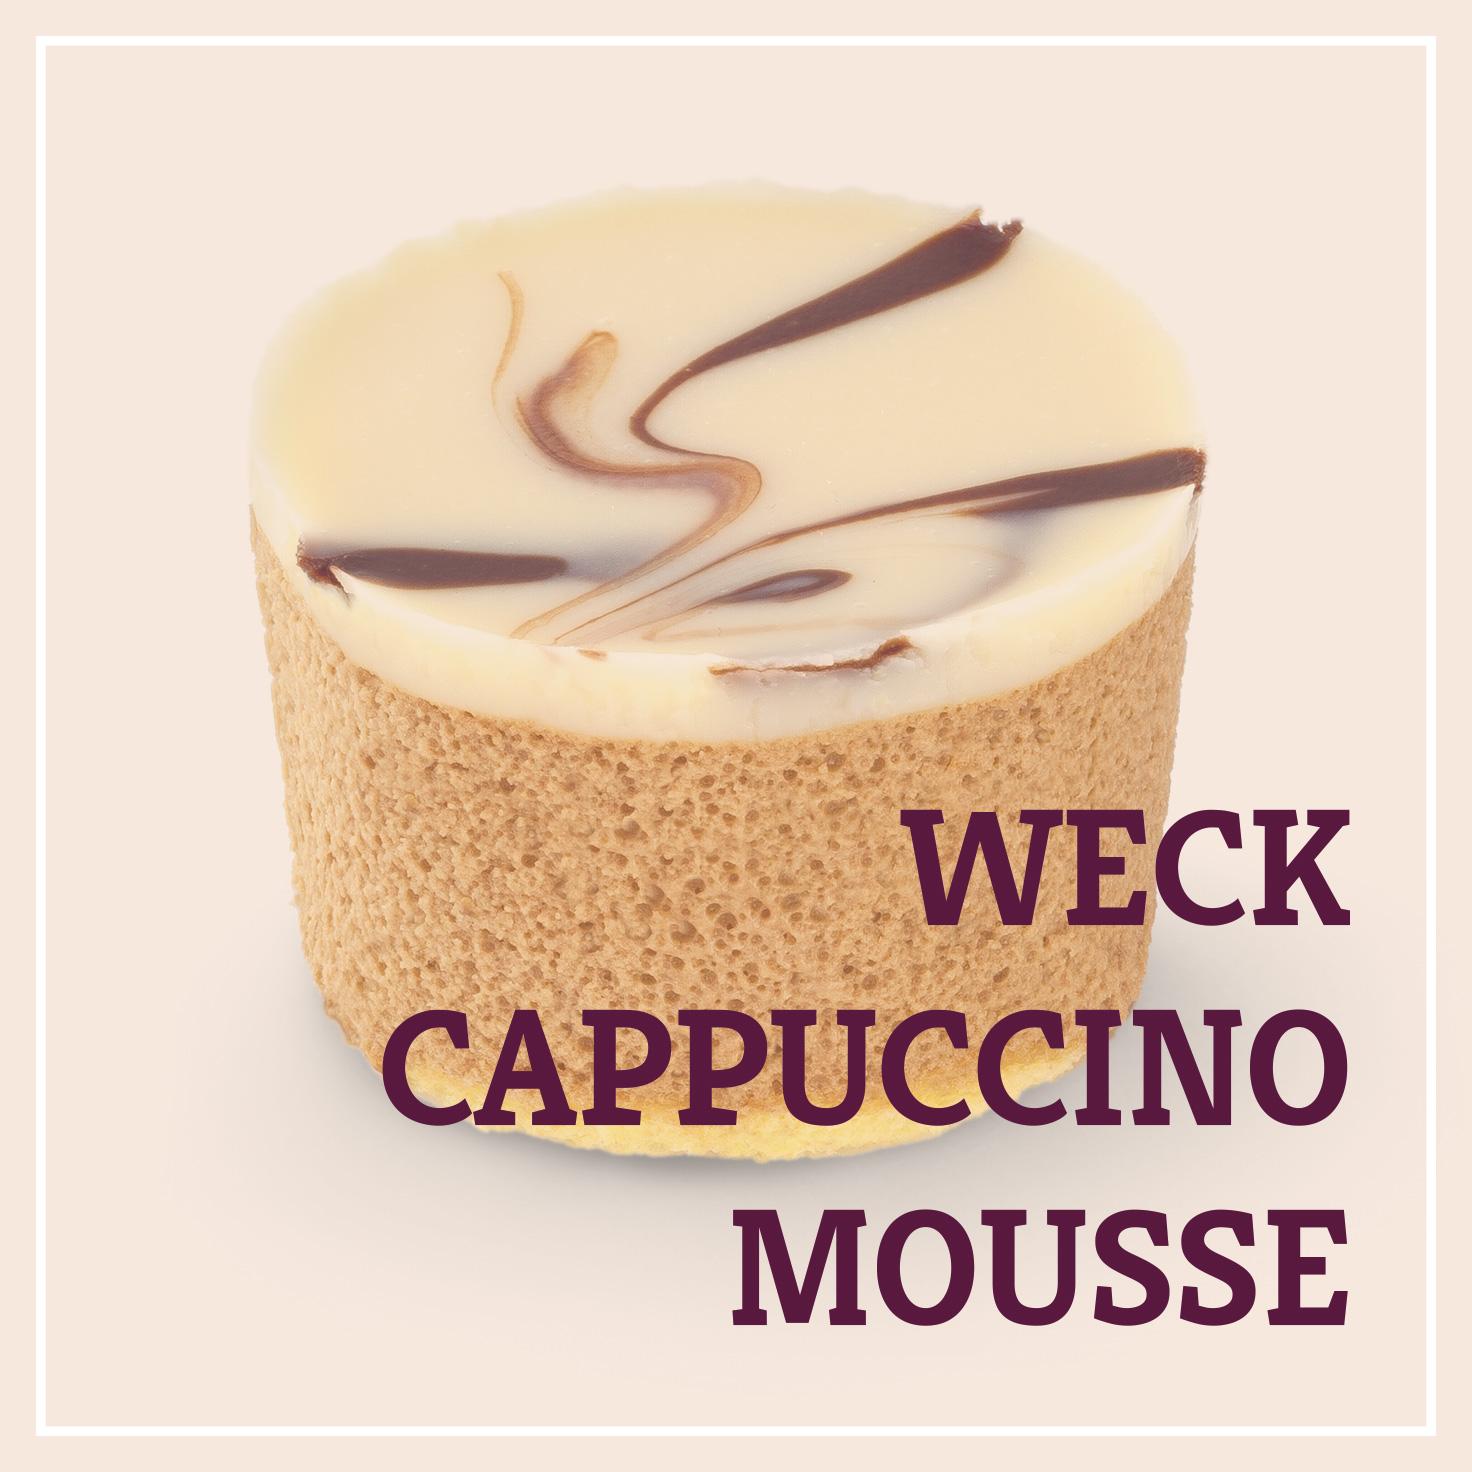 Heiss & Süß - Weck-Cappuccinomousse